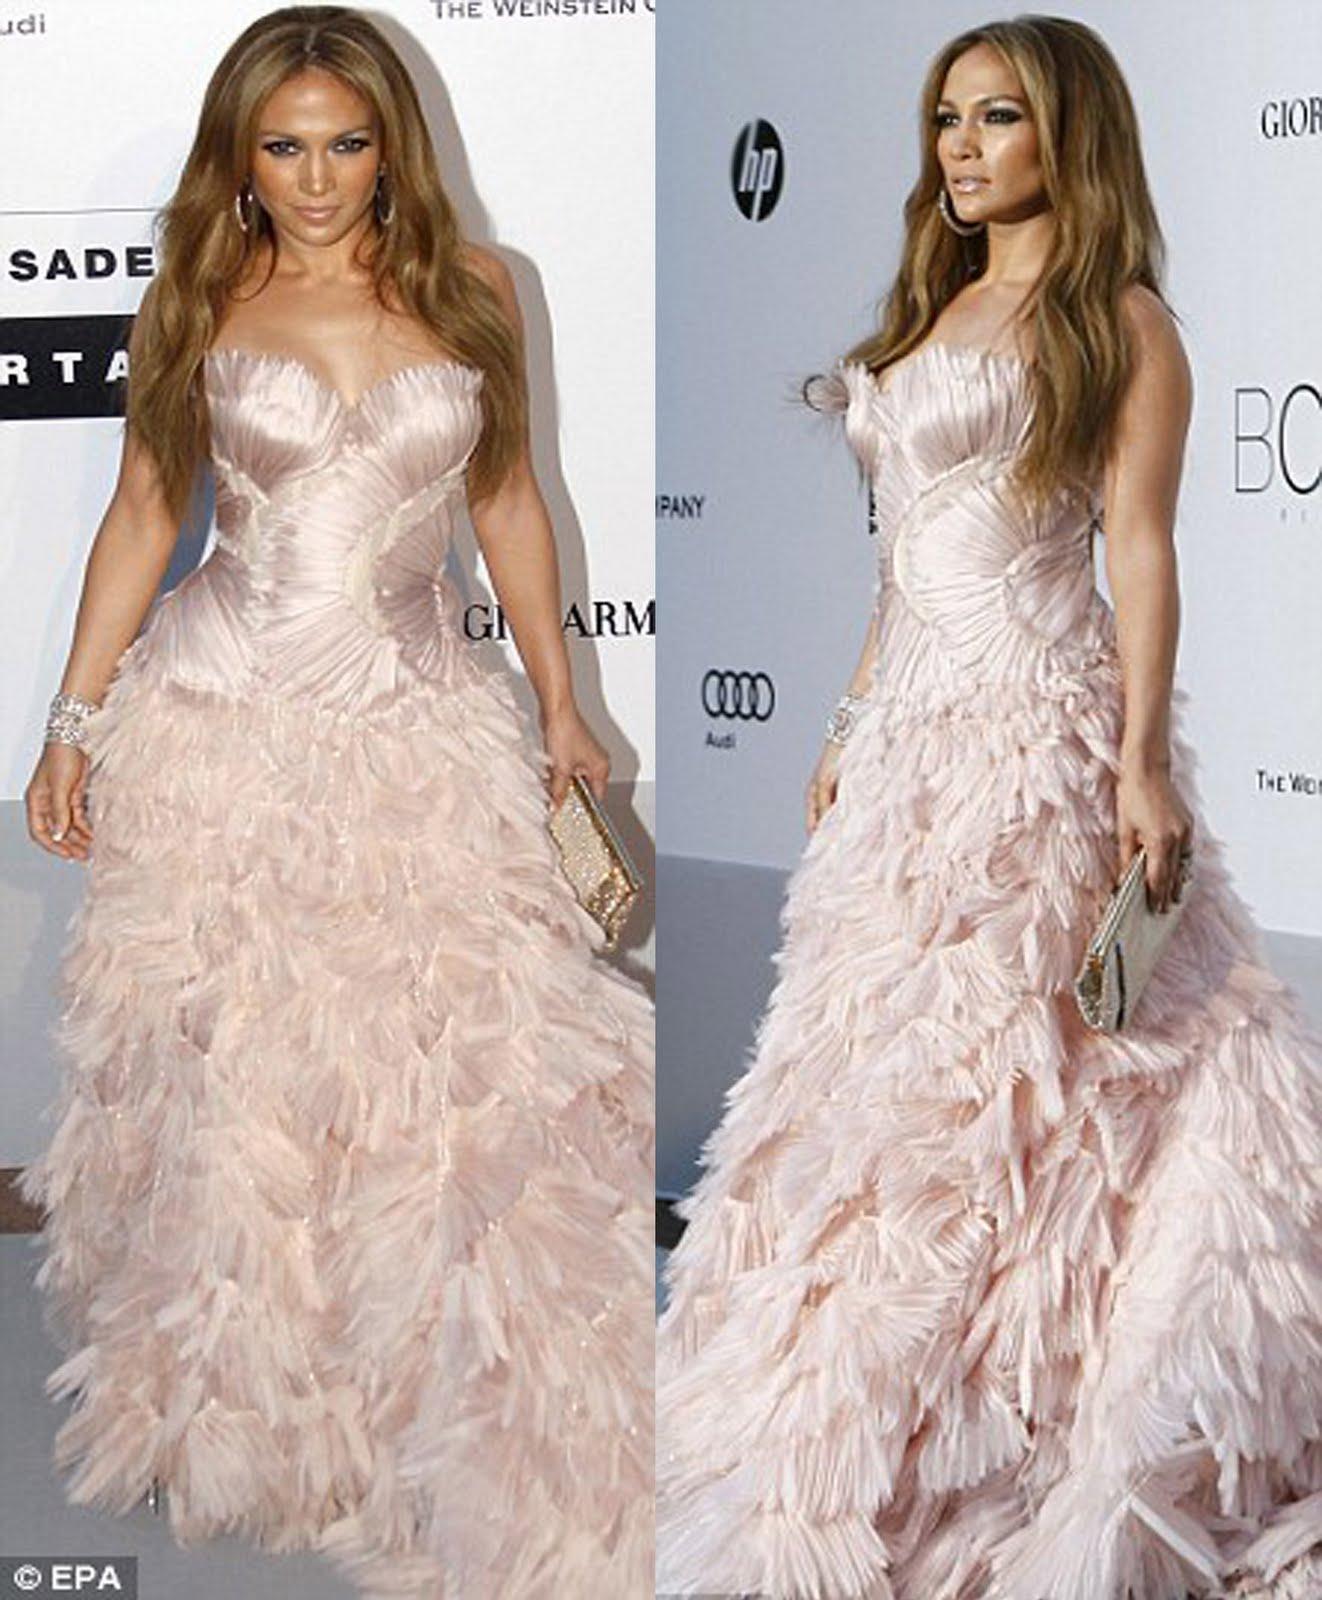 LiveLikeAPrincess My Dream Future Wedding Dress as